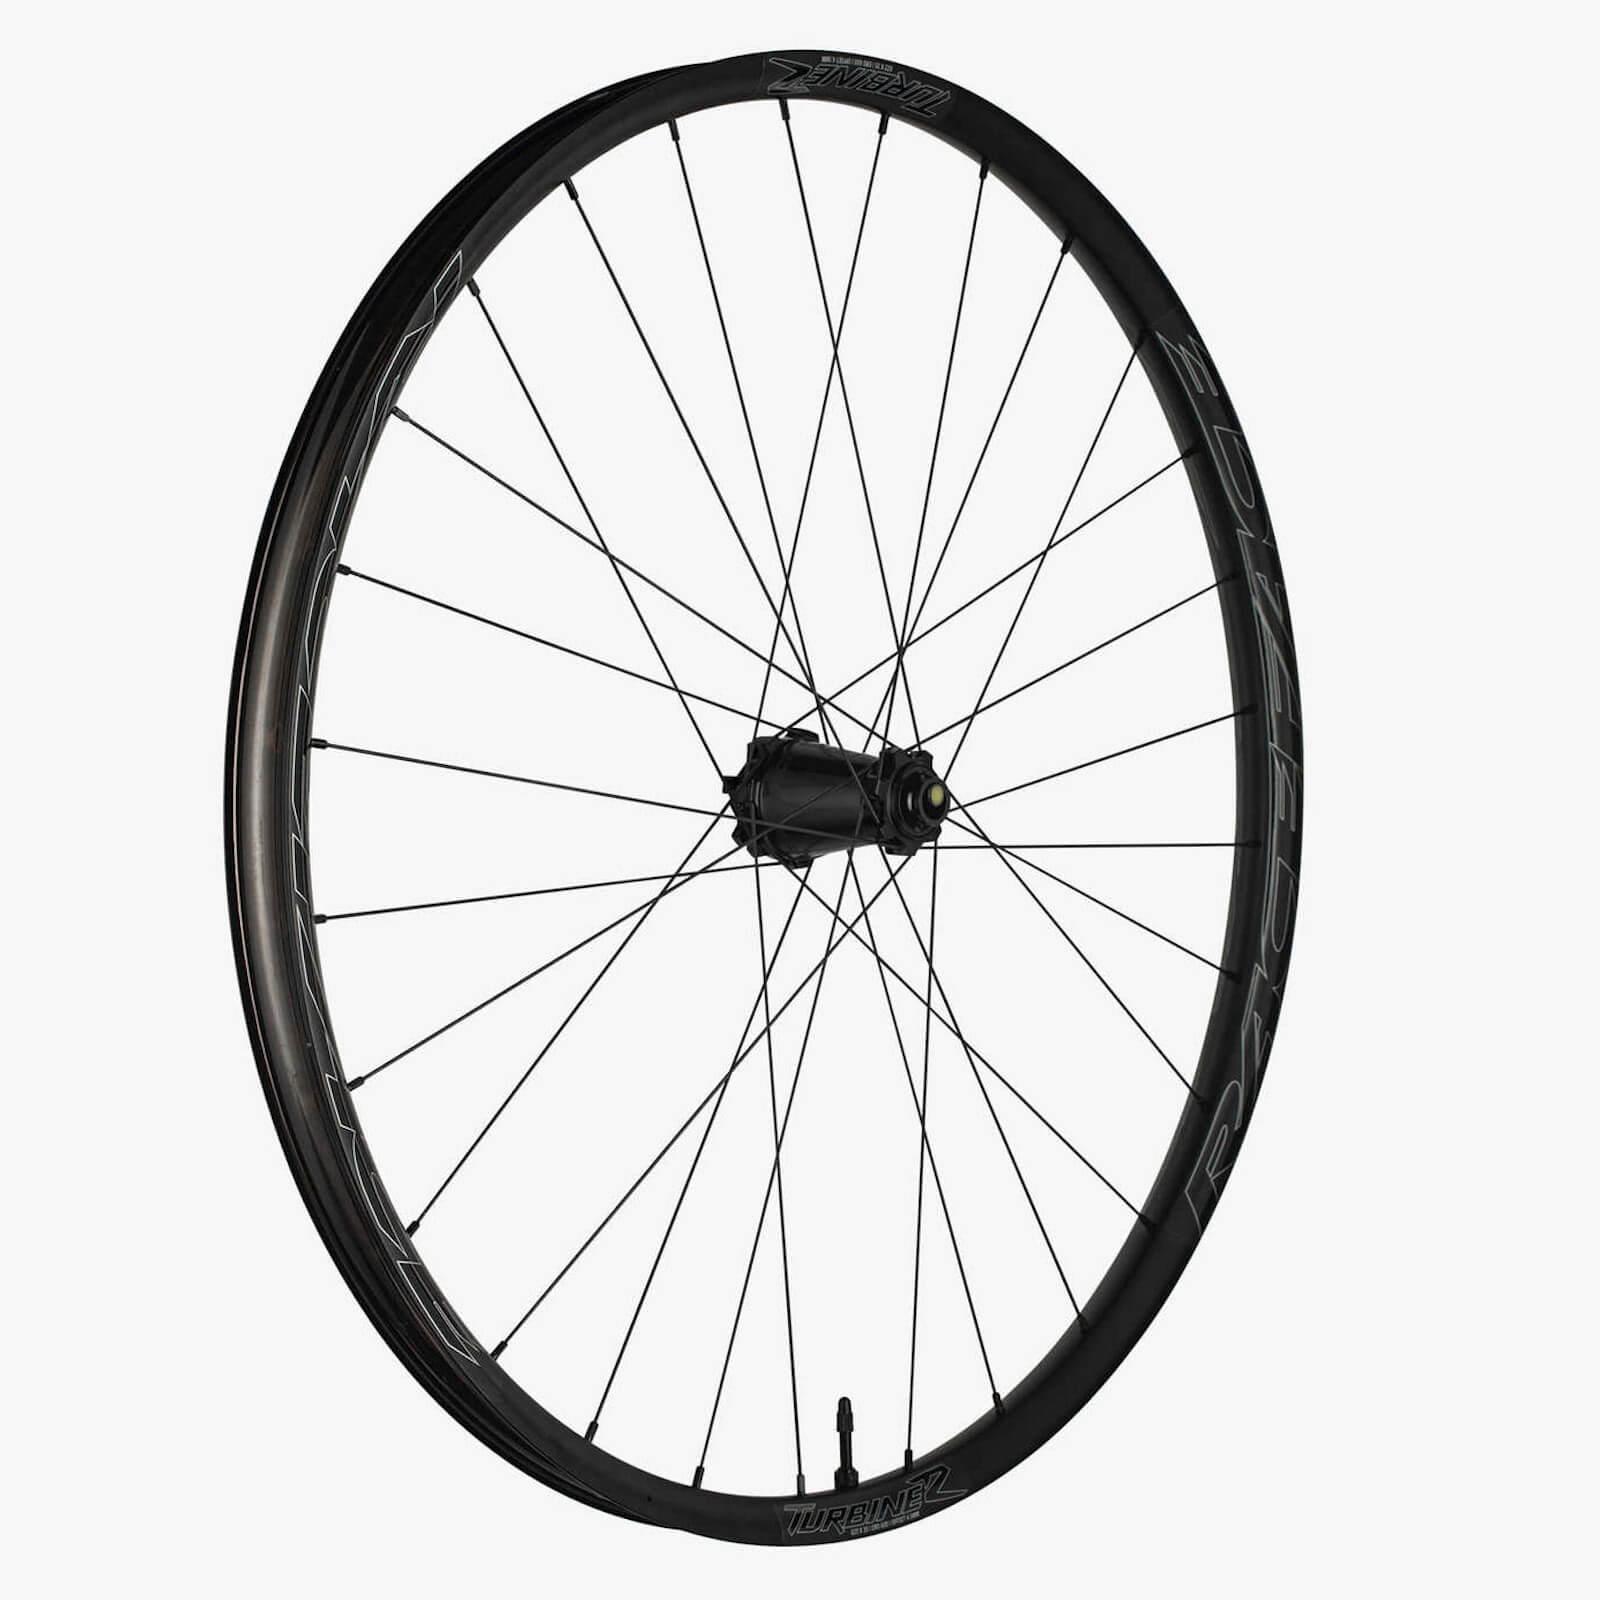 Race Face Turbine R 35mm MTB Alloy Front Wheel - 27.5 Inch/15 x 110mm